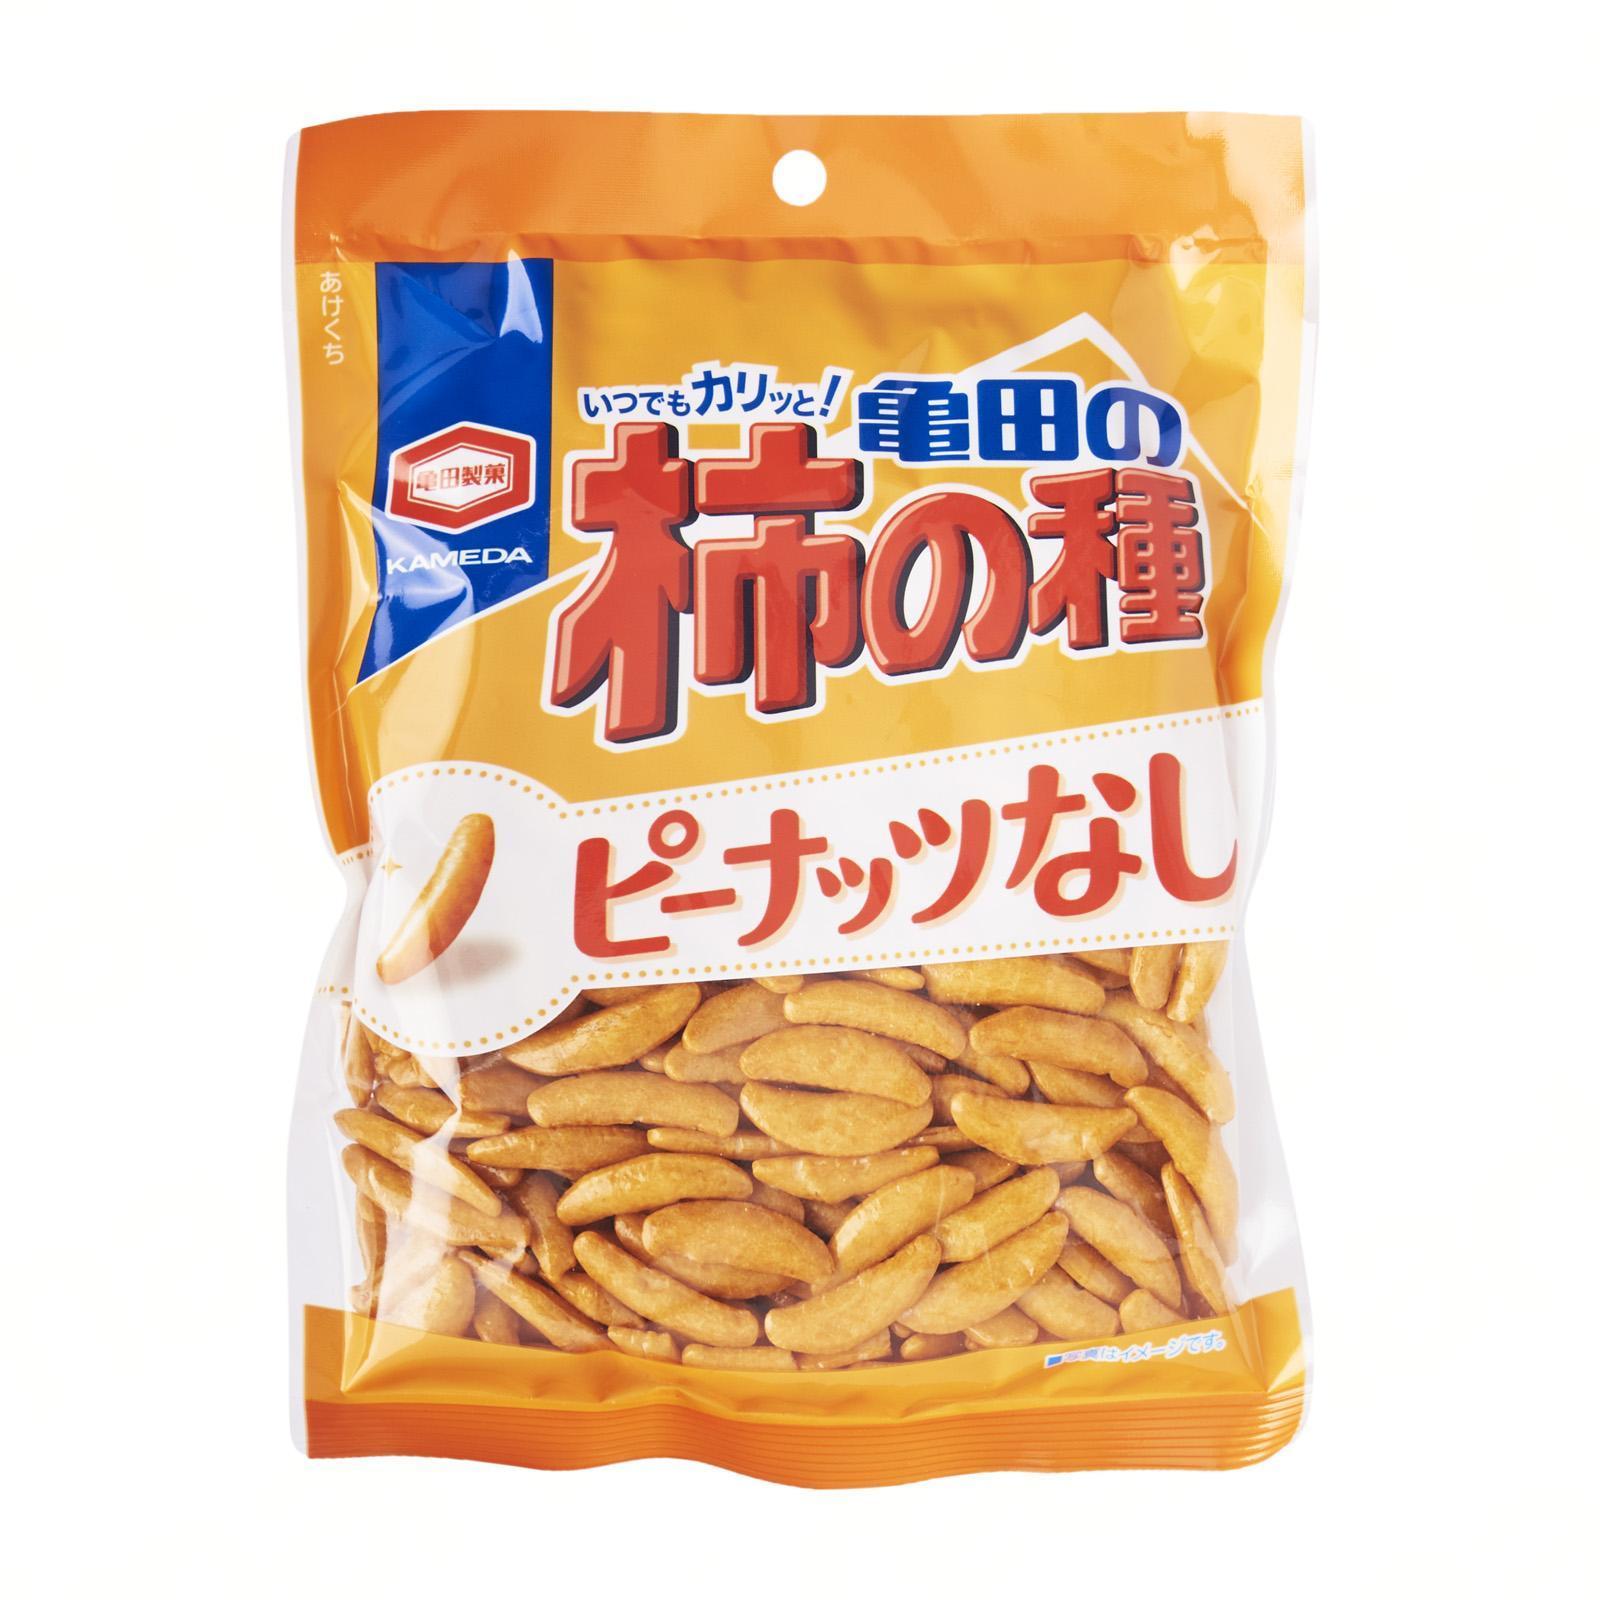 Kameda Kakinotane 100% Japanese Rice Cracker - By J-mart Japanese Food Market